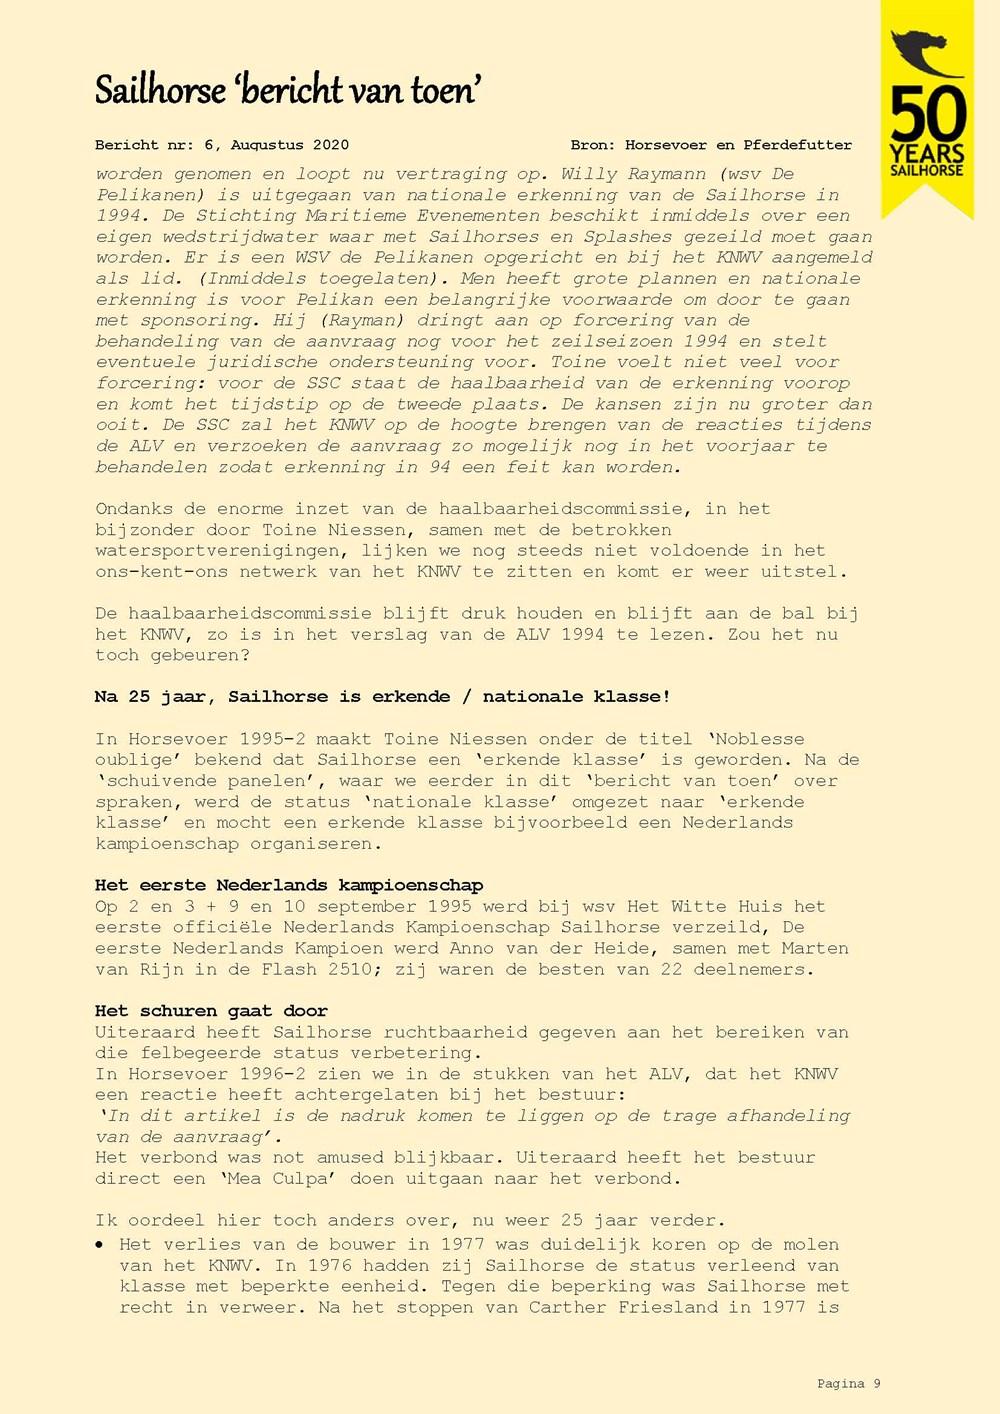 BvT06_3_Page_09.jpg